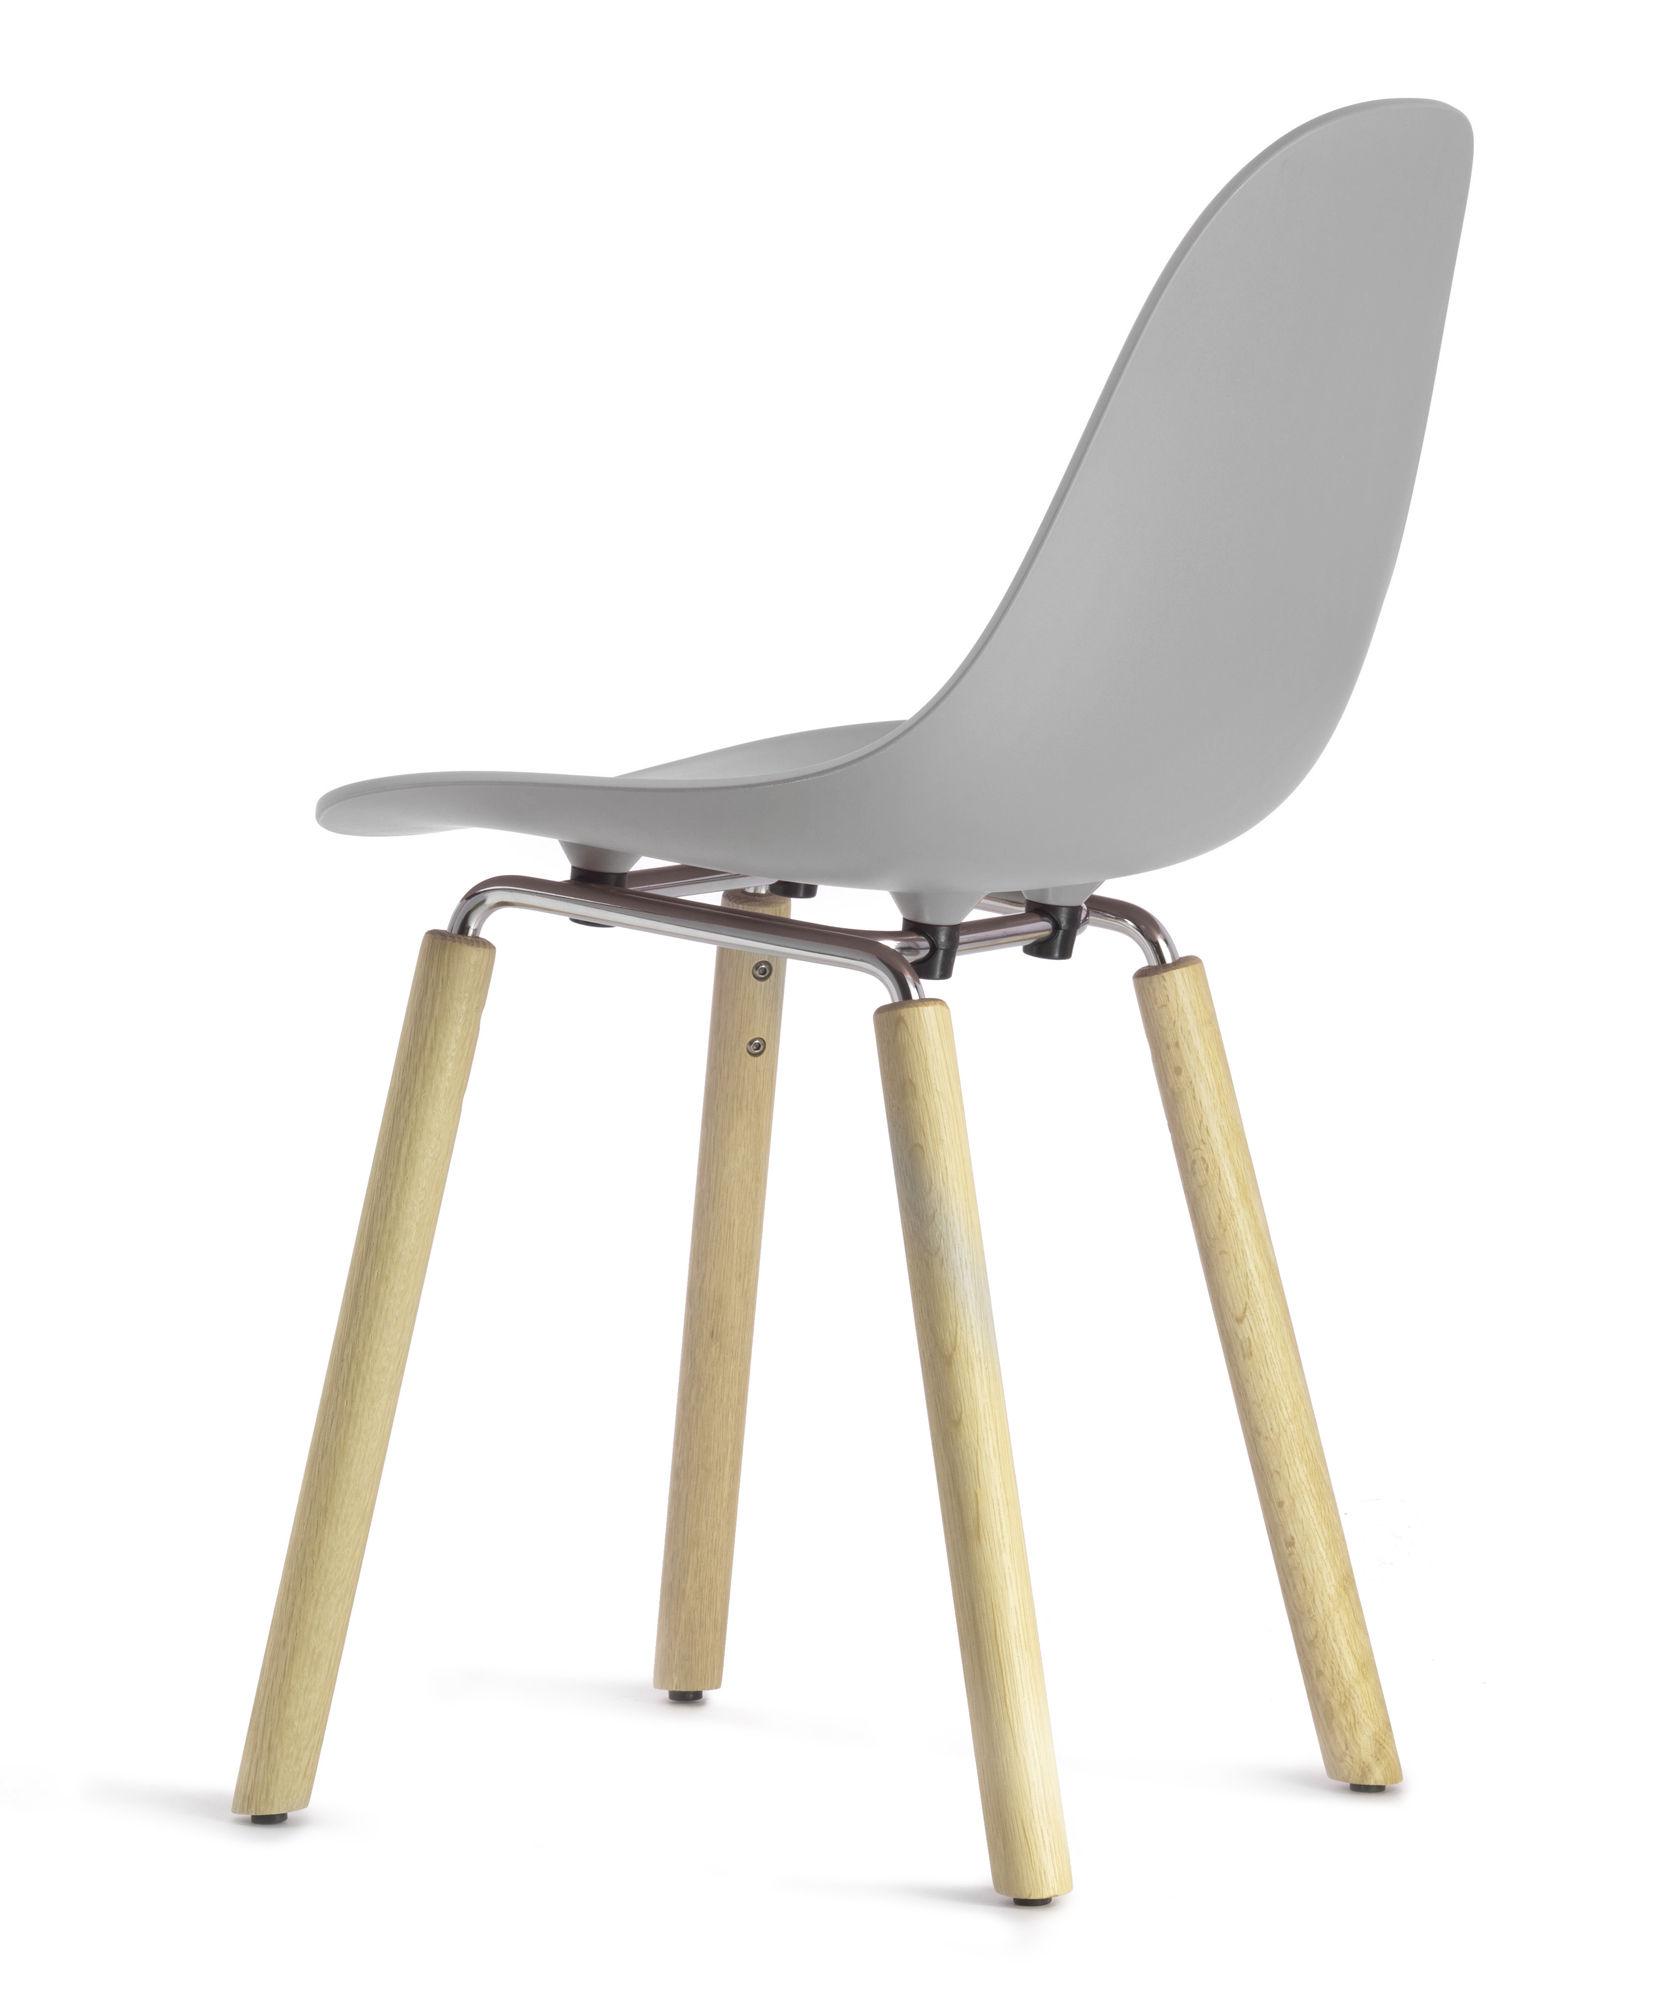 chaise ta pieds bois gris pieds bois naturel toou made in design. Black Bedroom Furniture Sets. Home Design Ideas